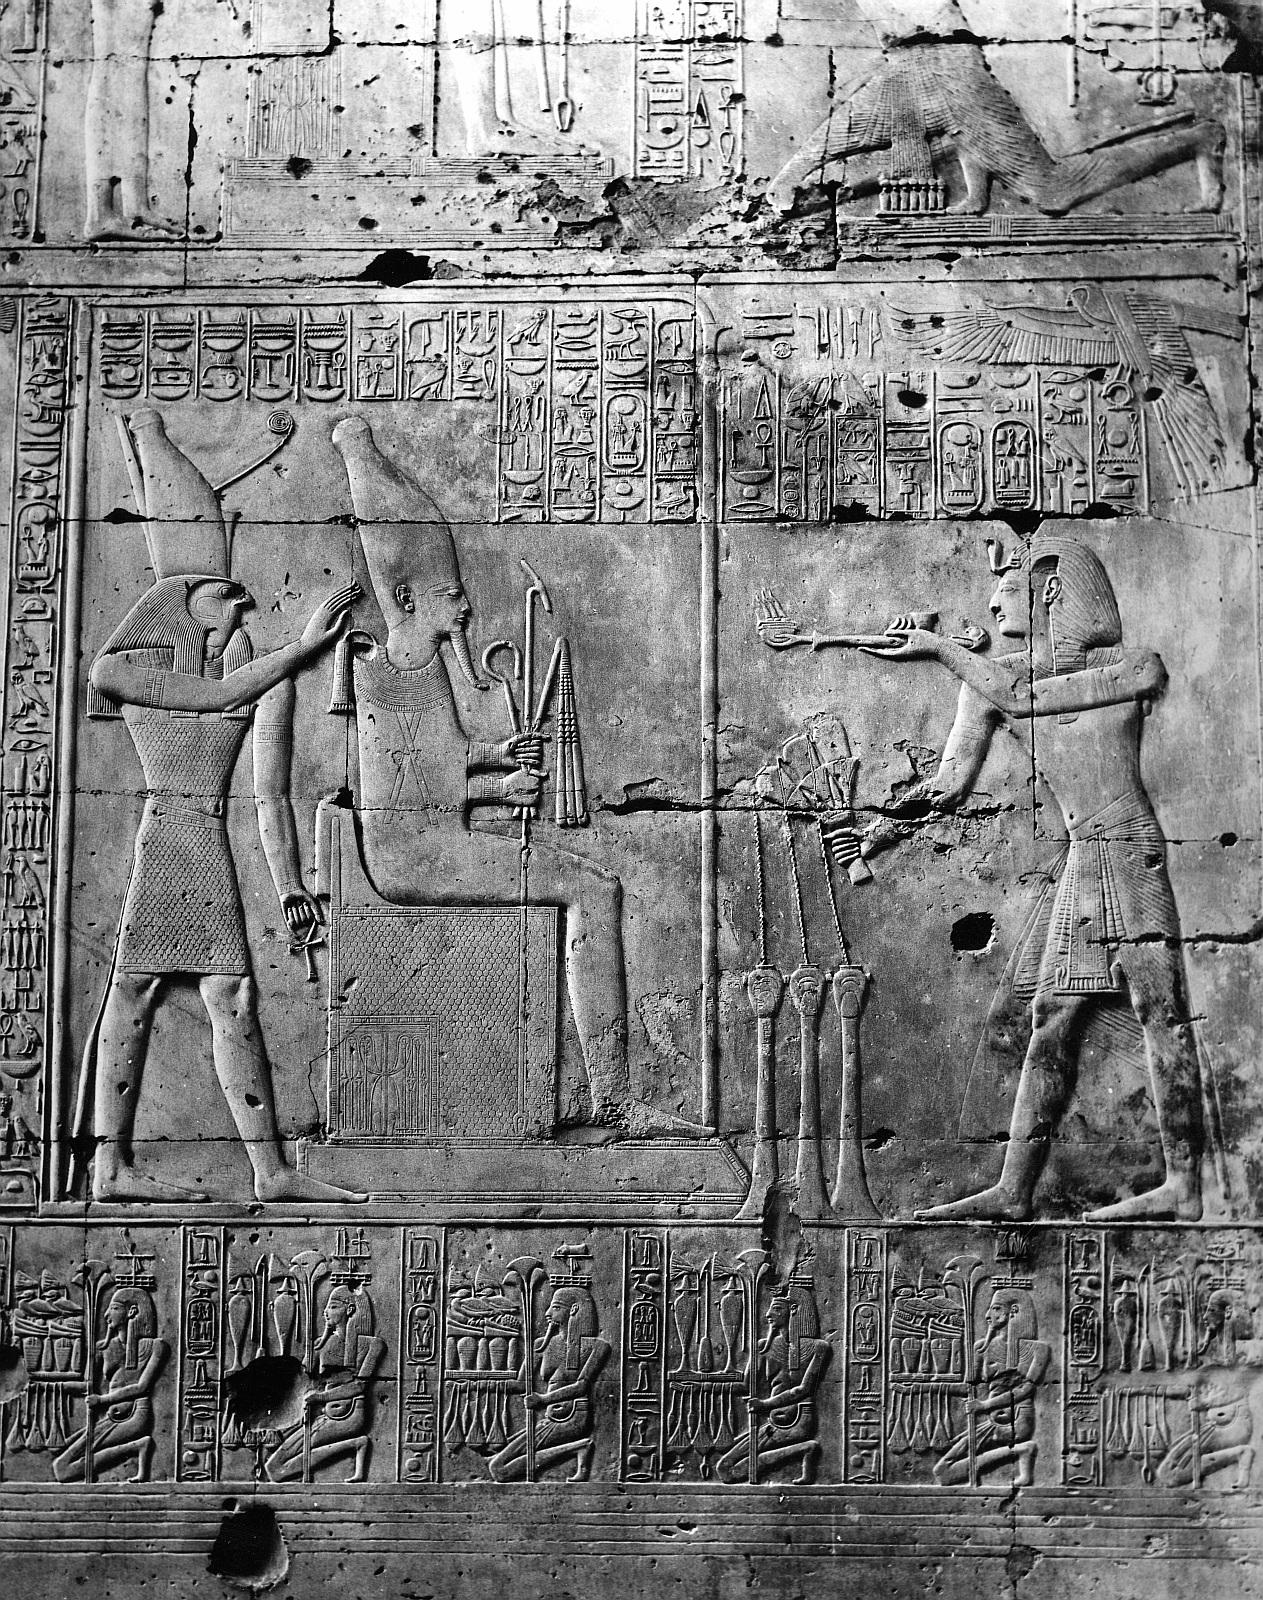 Абидос. Храм Сети I.  Рельеф «Осирис и Хорус Сети I совершает воскурение богам»